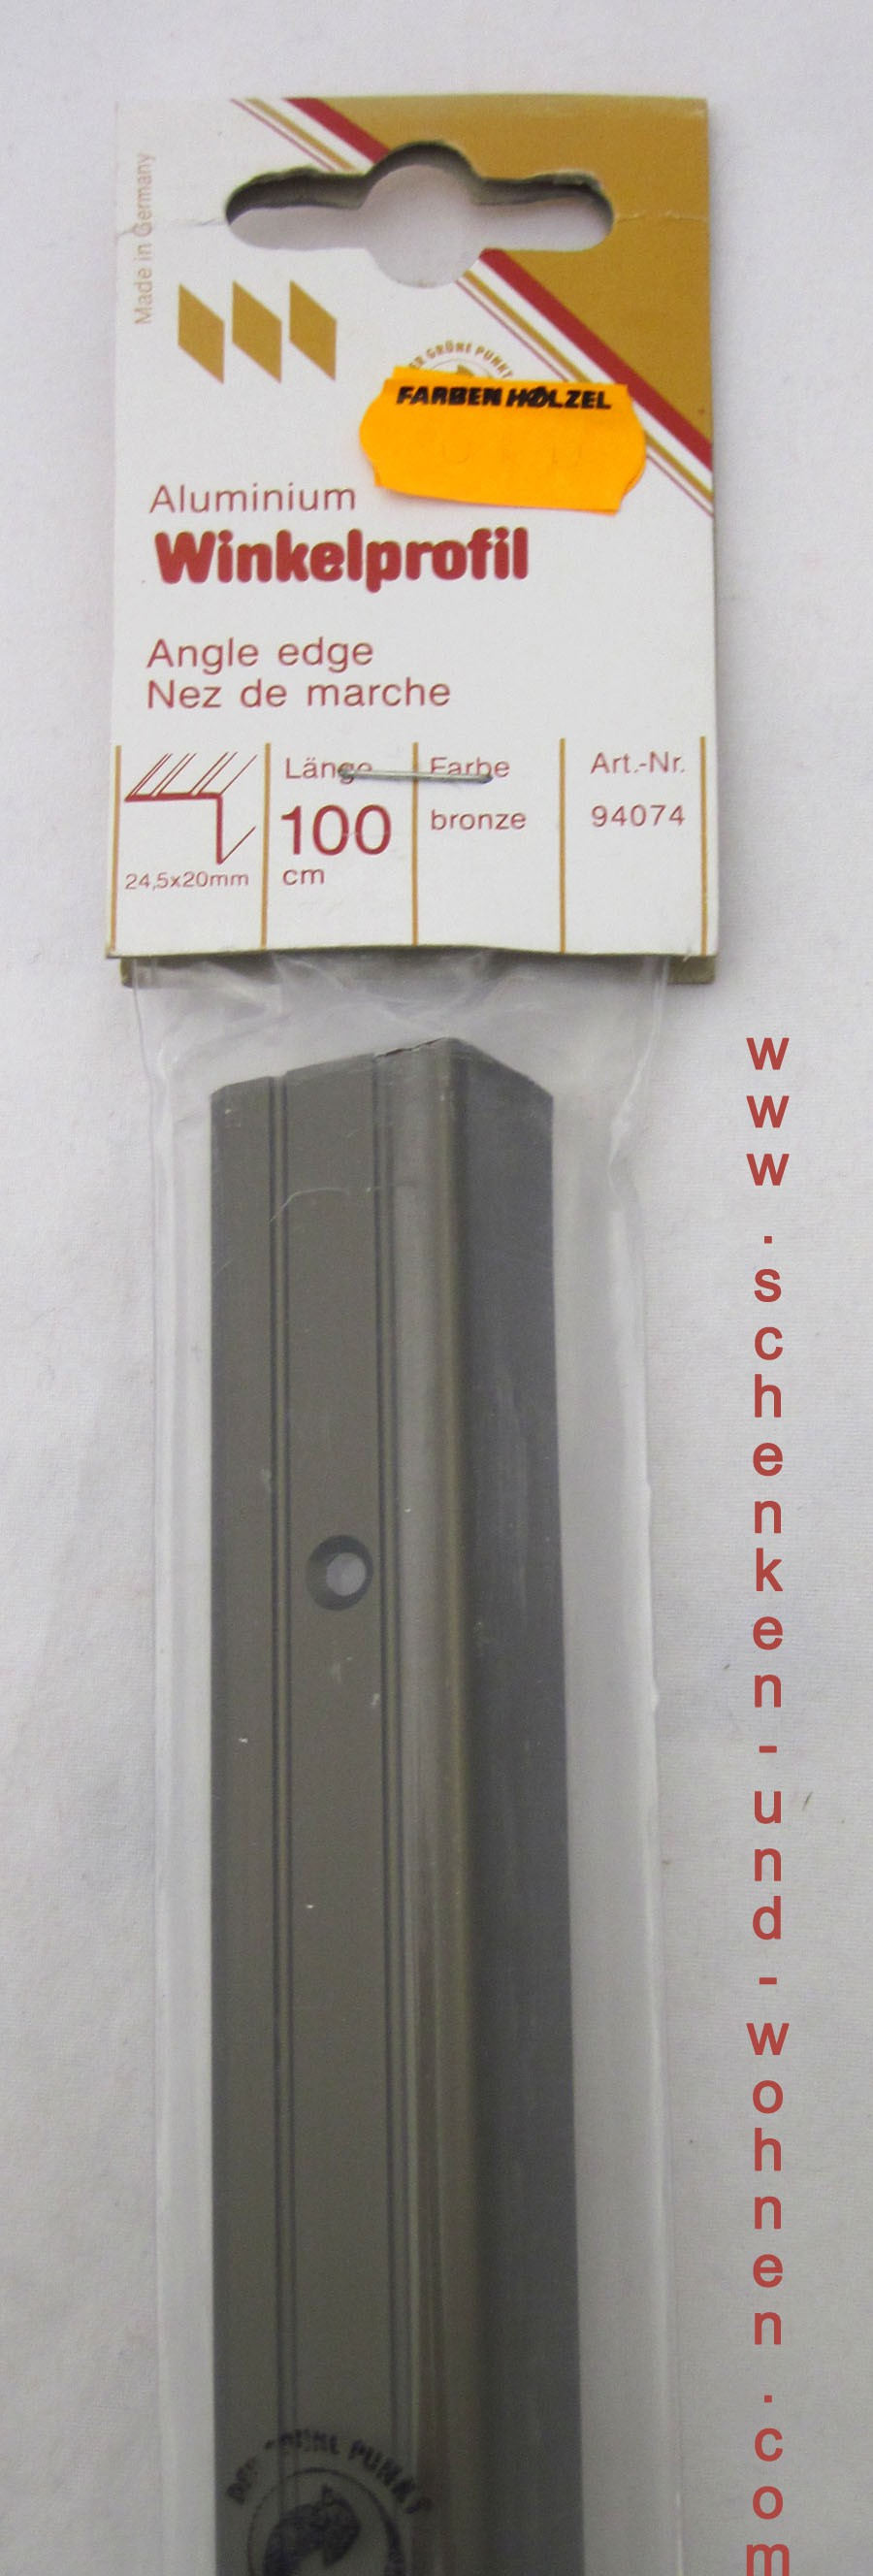 Winkelprofill Bodenprofil bronze dunkel 24,5x20mmx100 cm